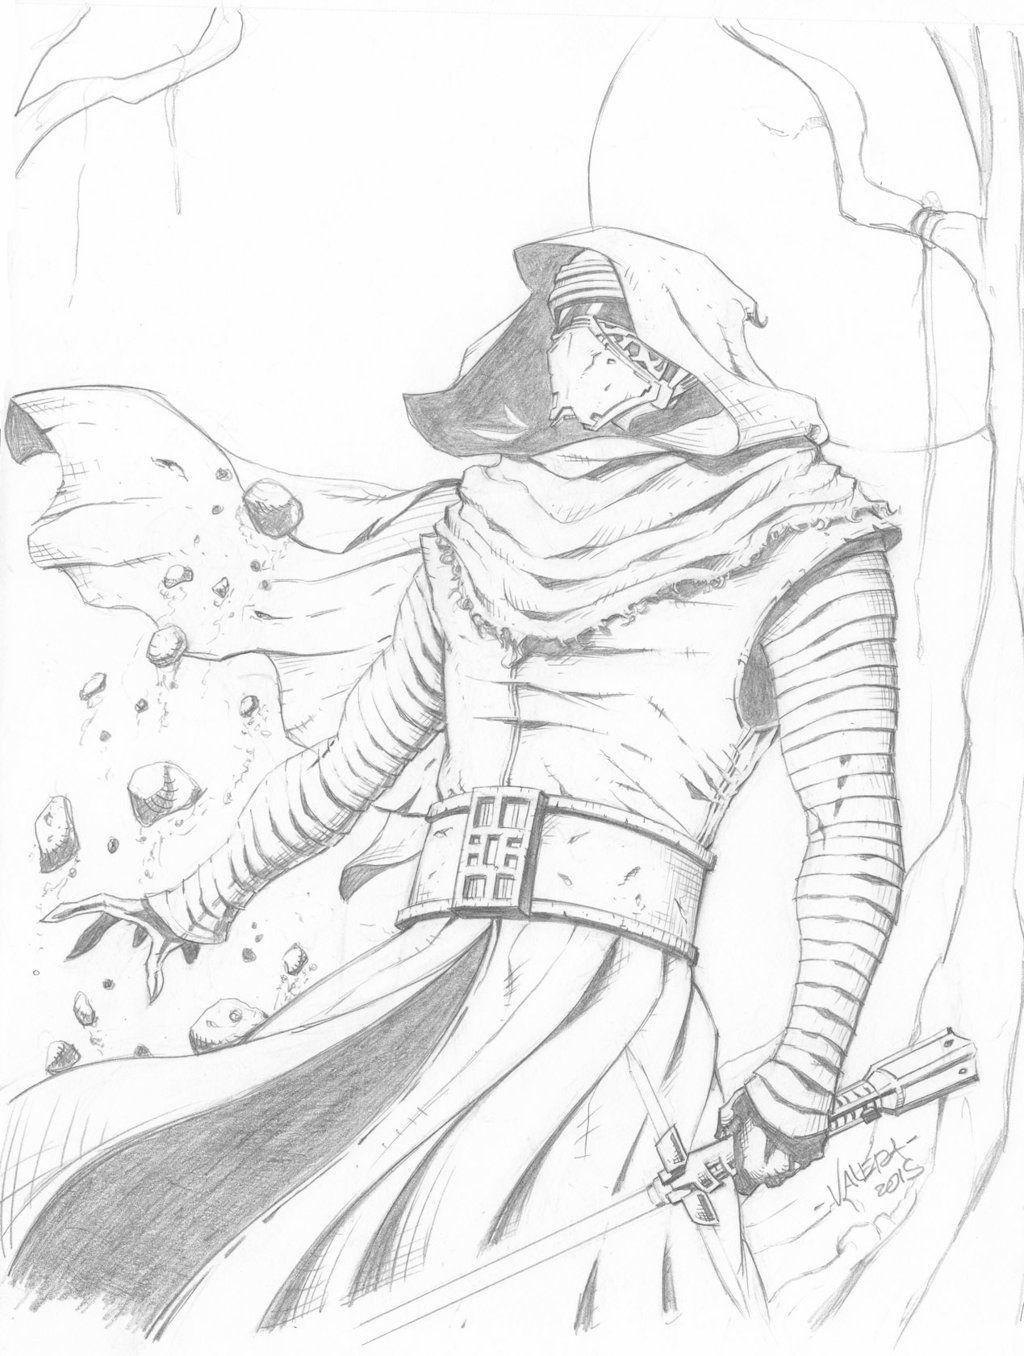 Kylo Ren Sketch By Rv1994 D8tmj17 Jpg 1024 1356 Star Wars Drawings Star Wars Artwork Star Wars Art